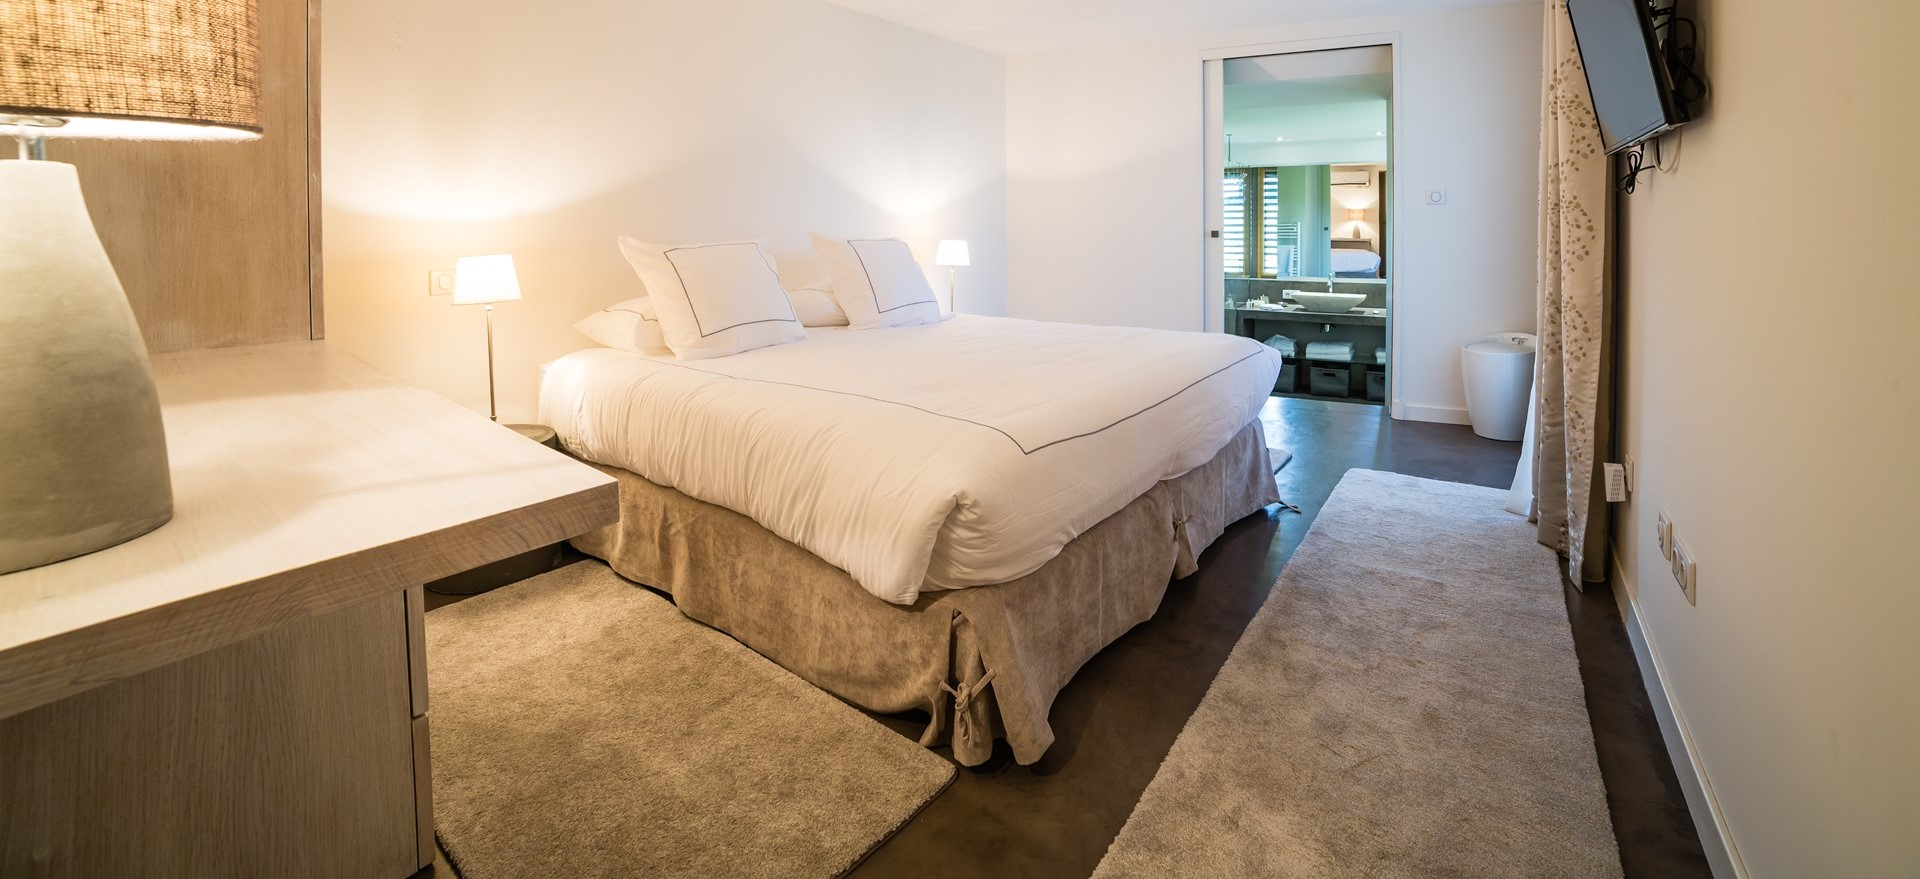 luxury-11-bedroom-villa-dordogne-france.